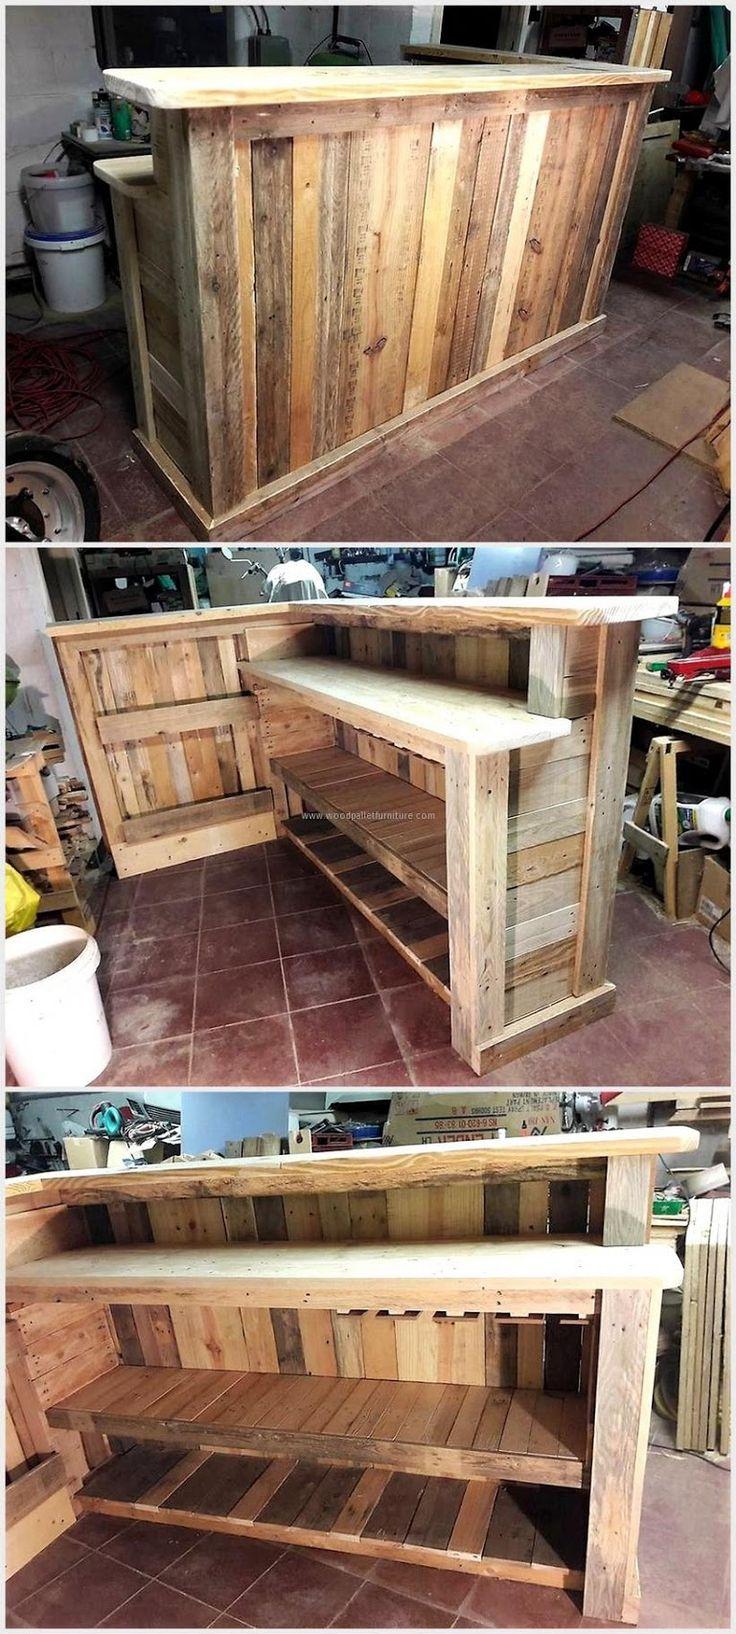 best 25 wooden bar ideas on pinterest wooden pallet ideas man cave bar and garage bar. Black Bedroom Furniture Sets. Home Design Ideas